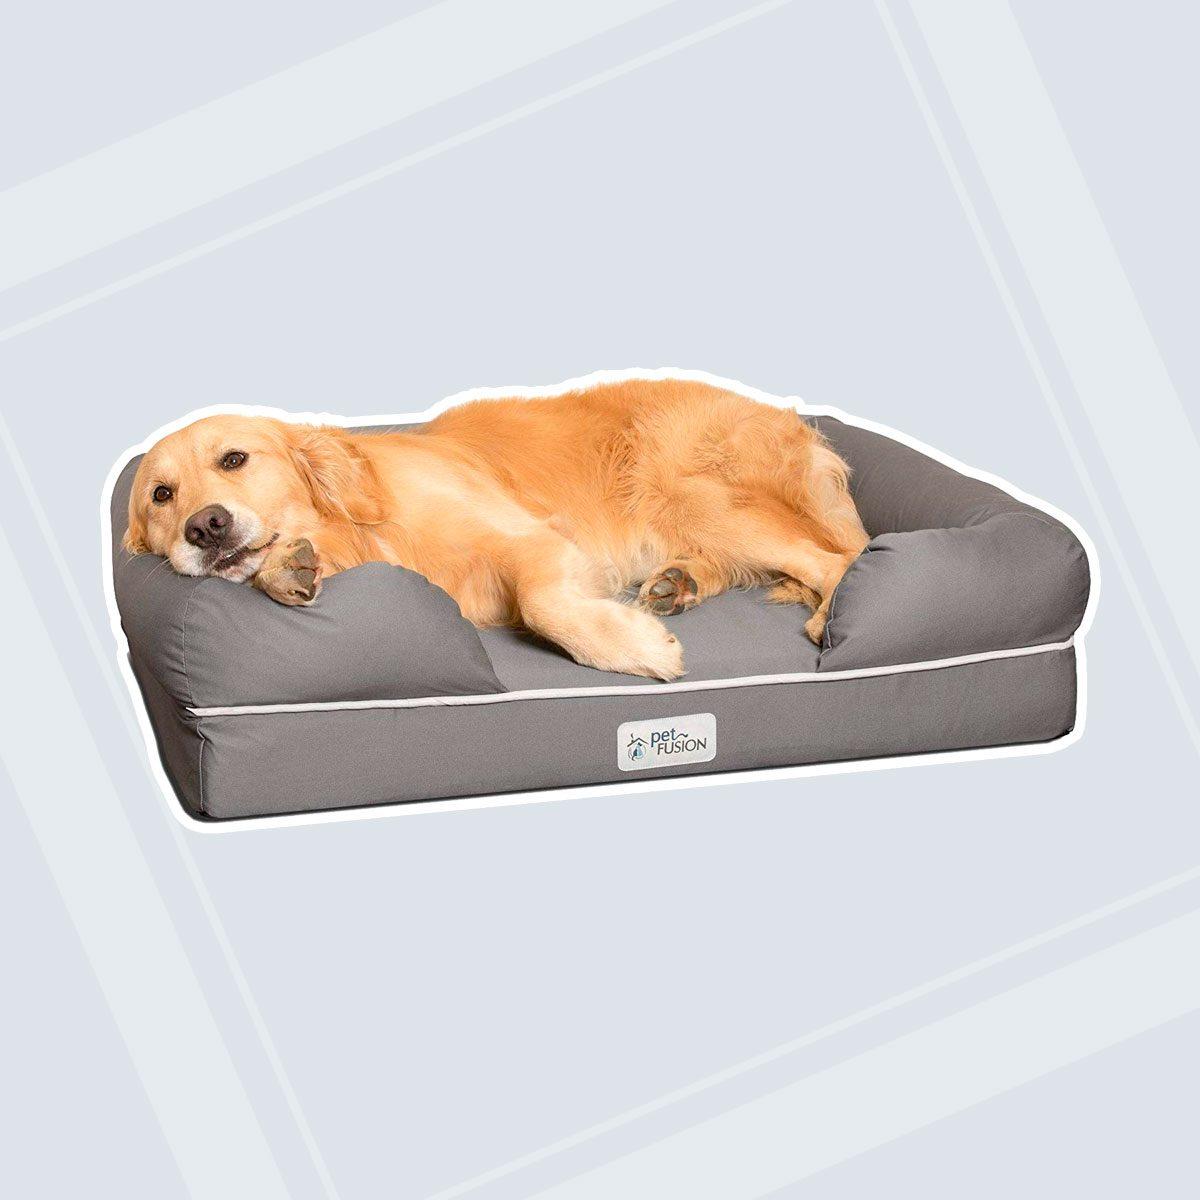 PetFusion Memory Foam Dog Bed